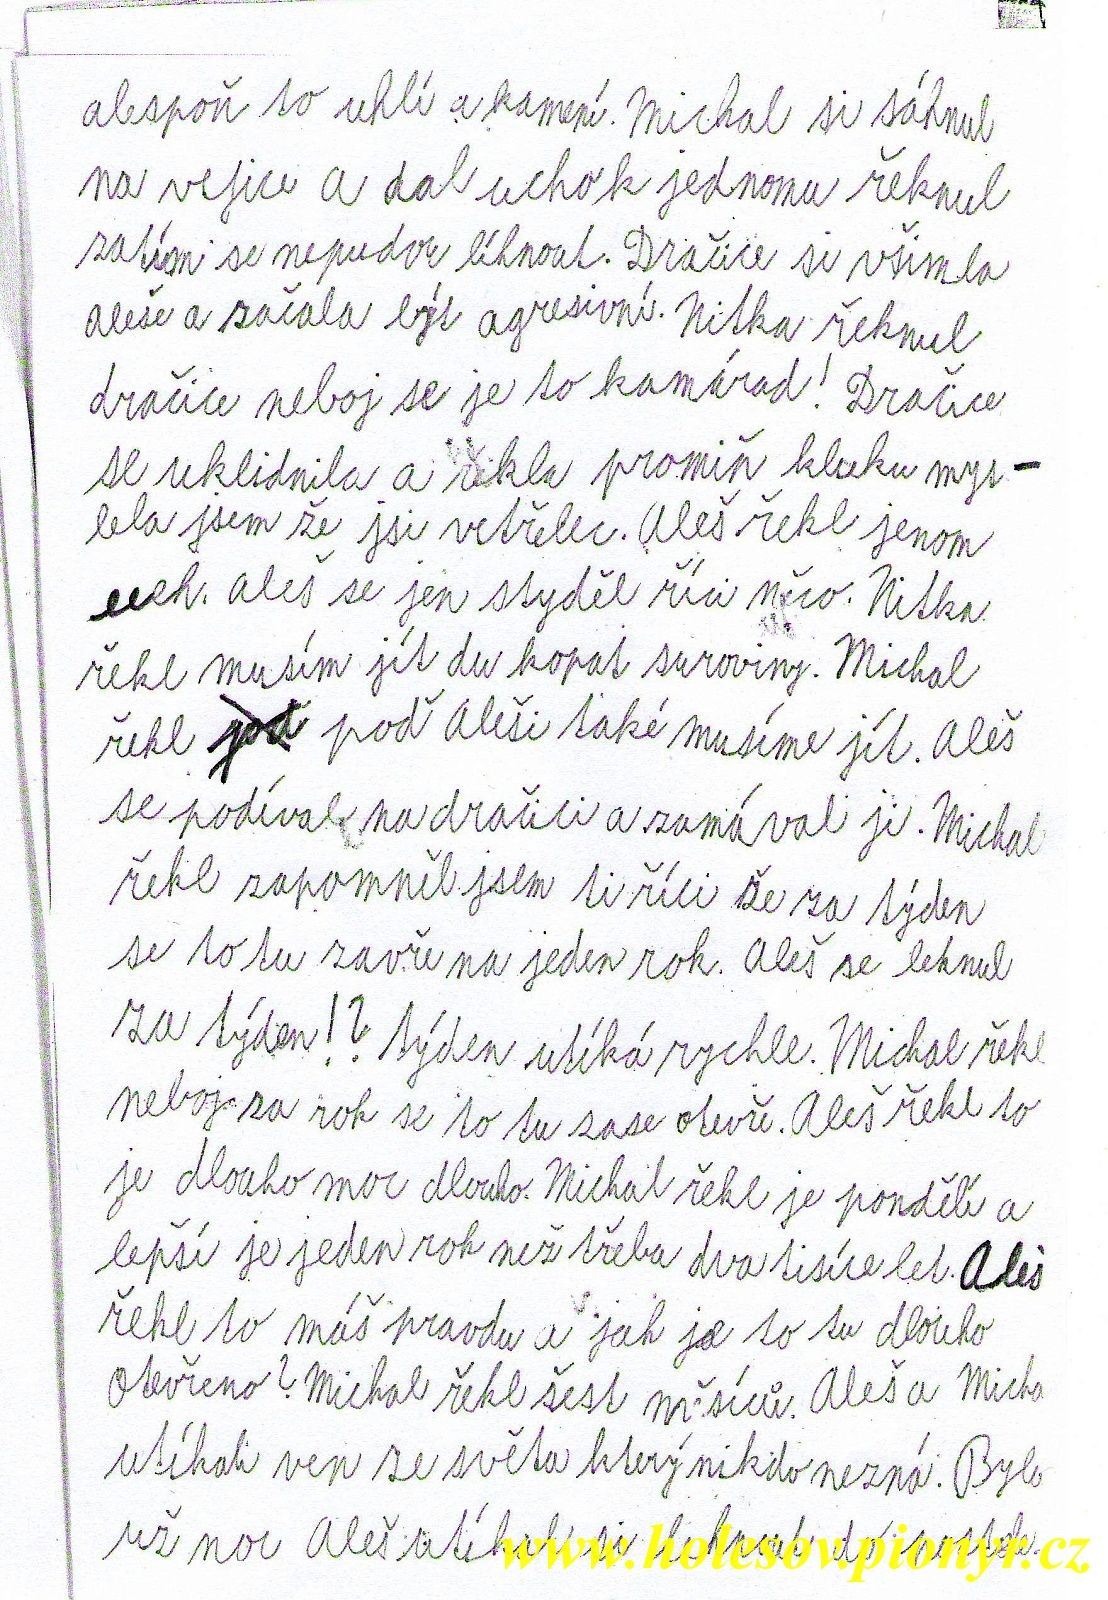 Hejduskova-Natalie-1-KATEGORIE-proza-1-misto_06